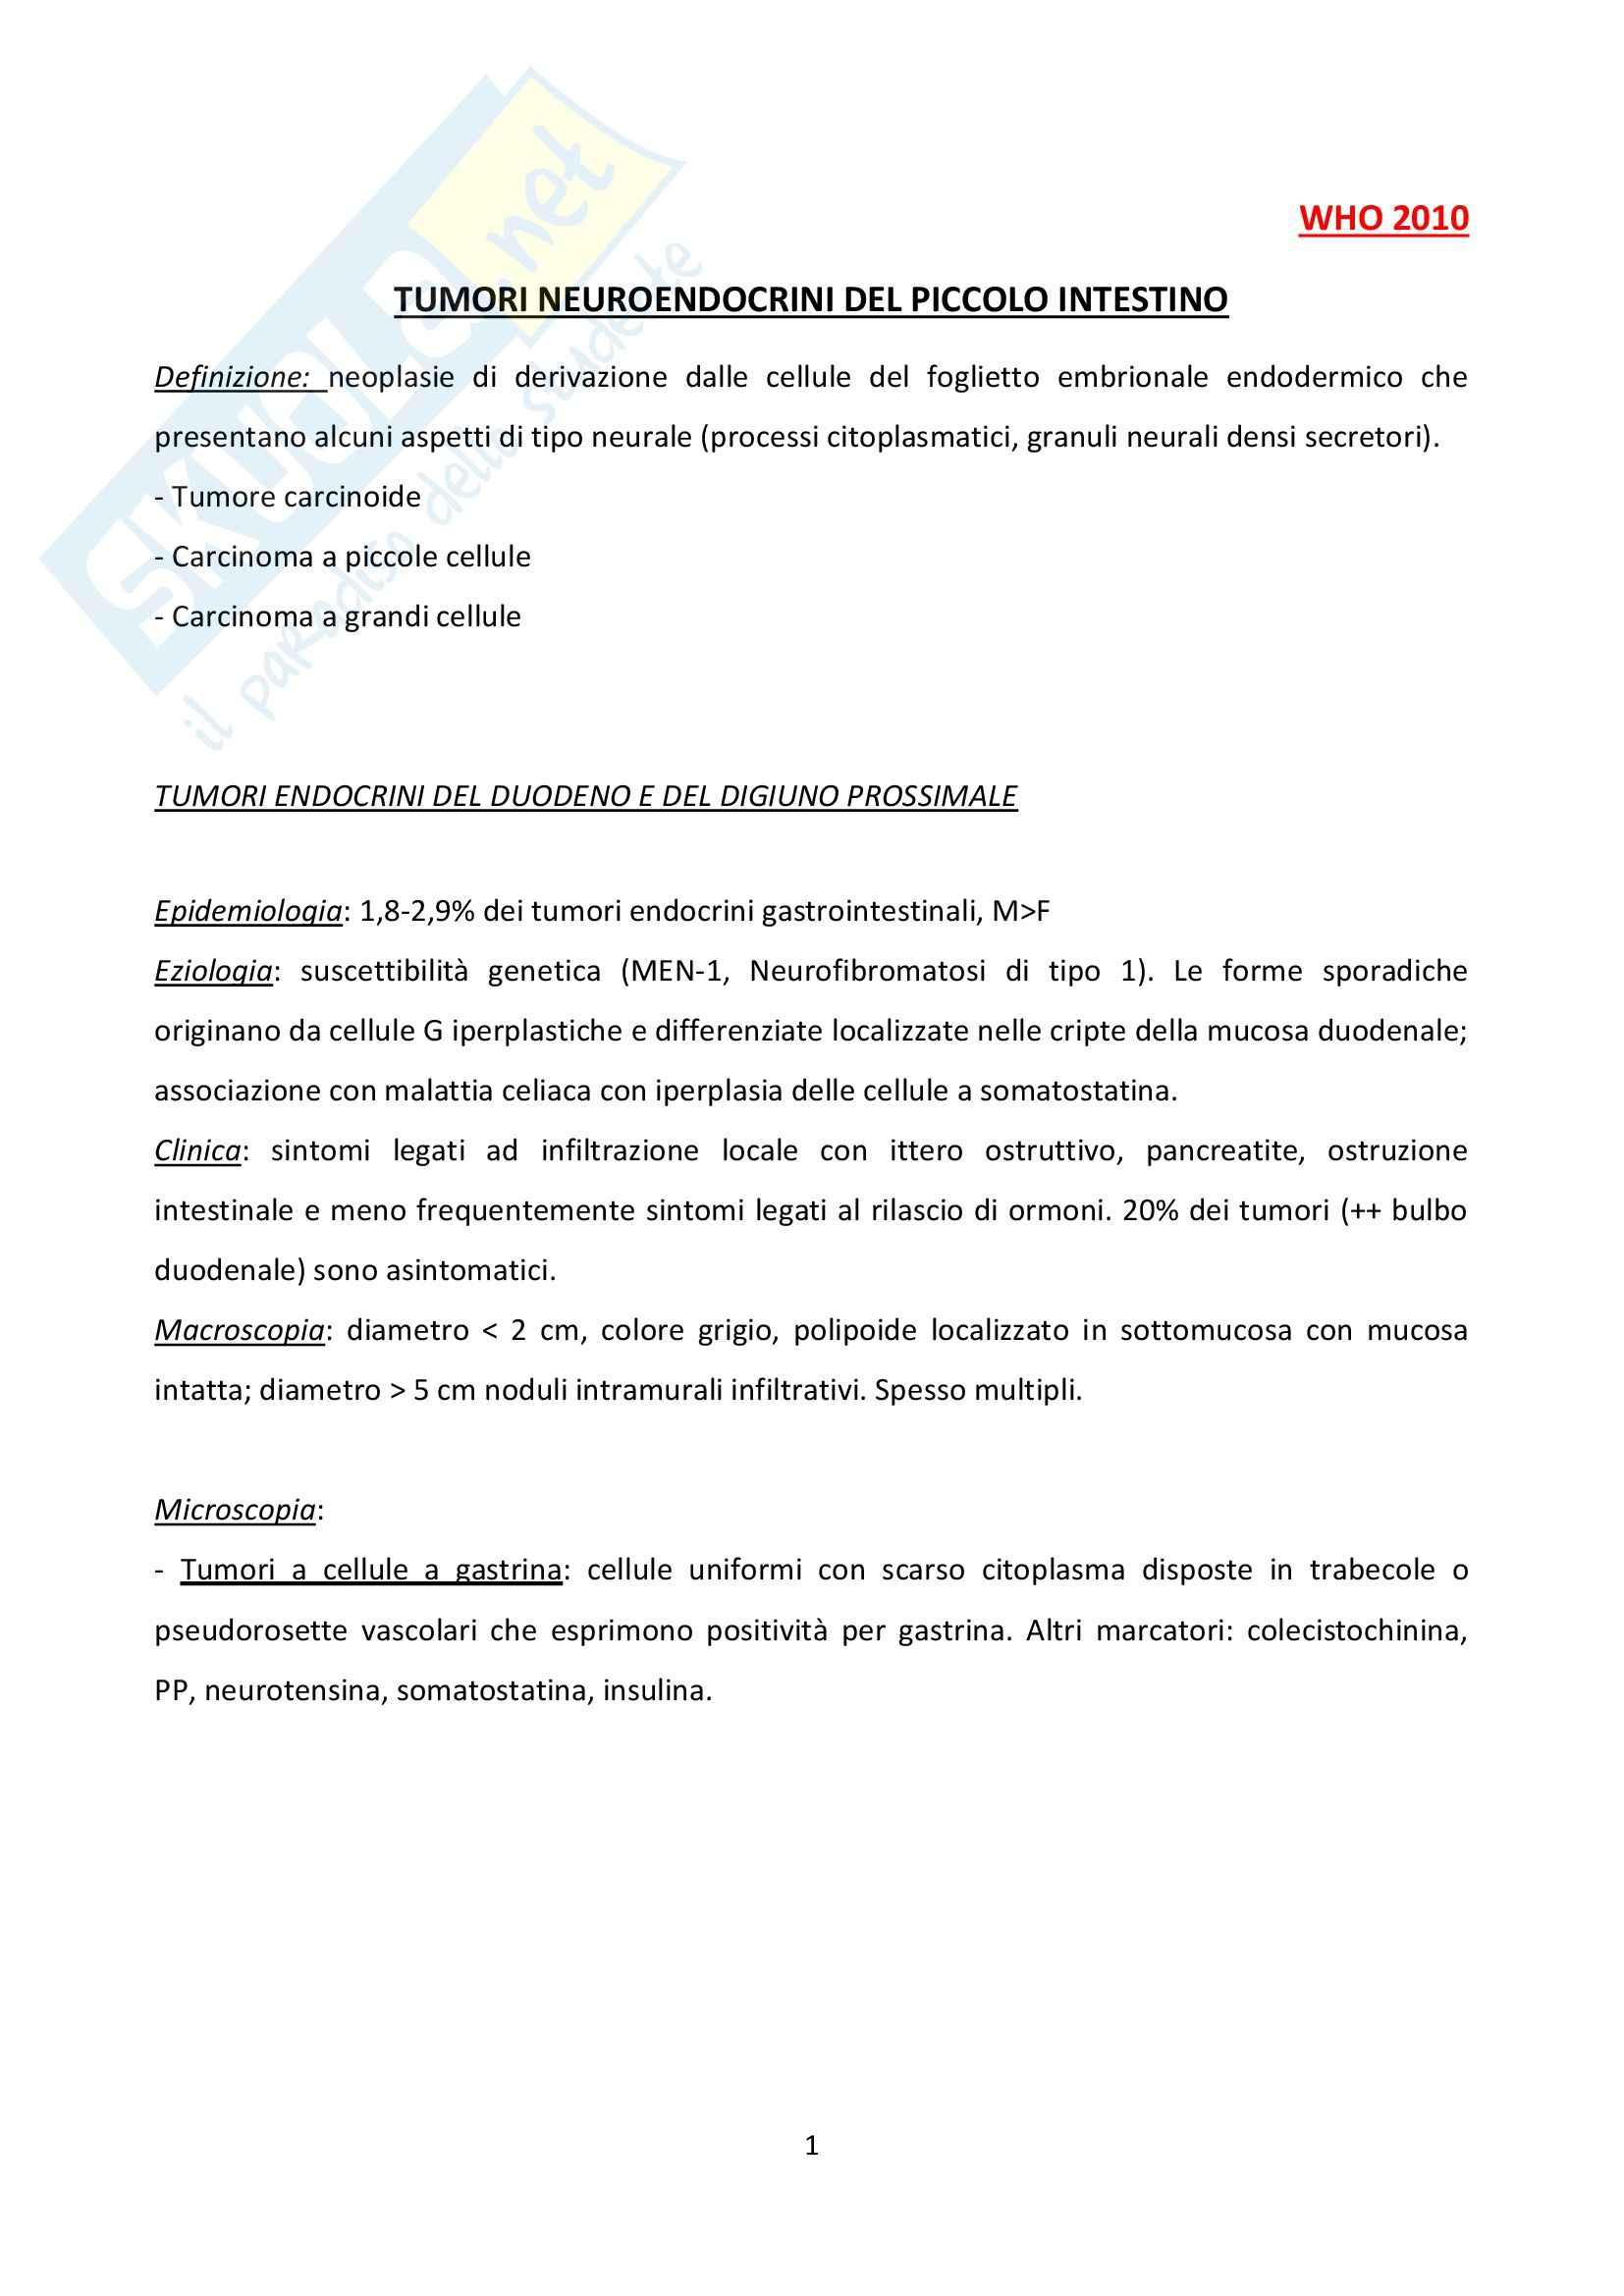 Tumori Neuroendocrini, Anatomia patologica